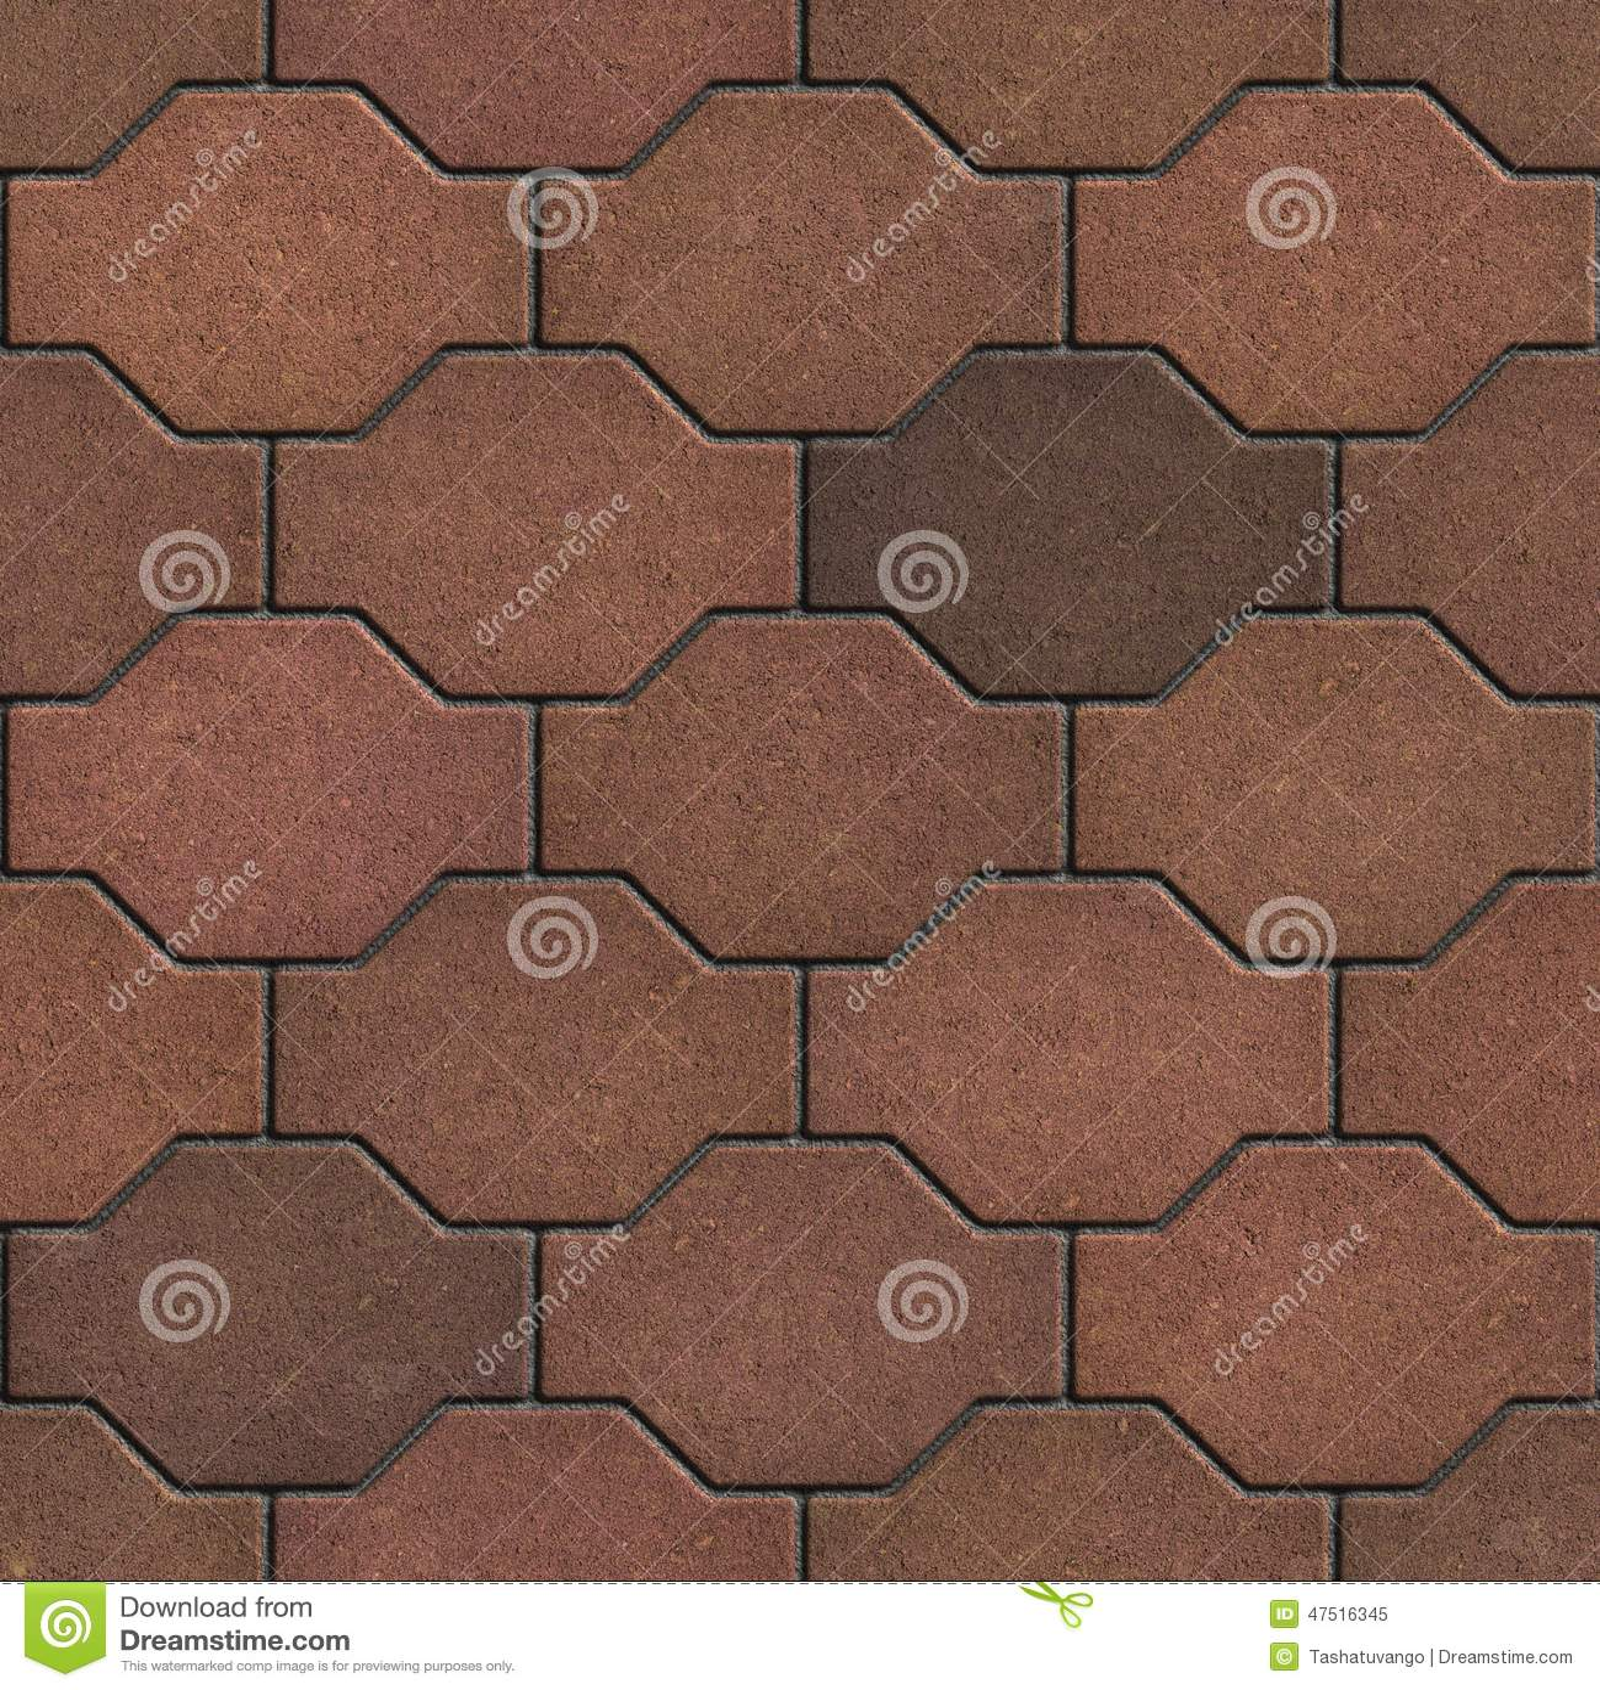 Decorative Brick Pavers decorative brown brick pavers. stock illustration - image: 47516345